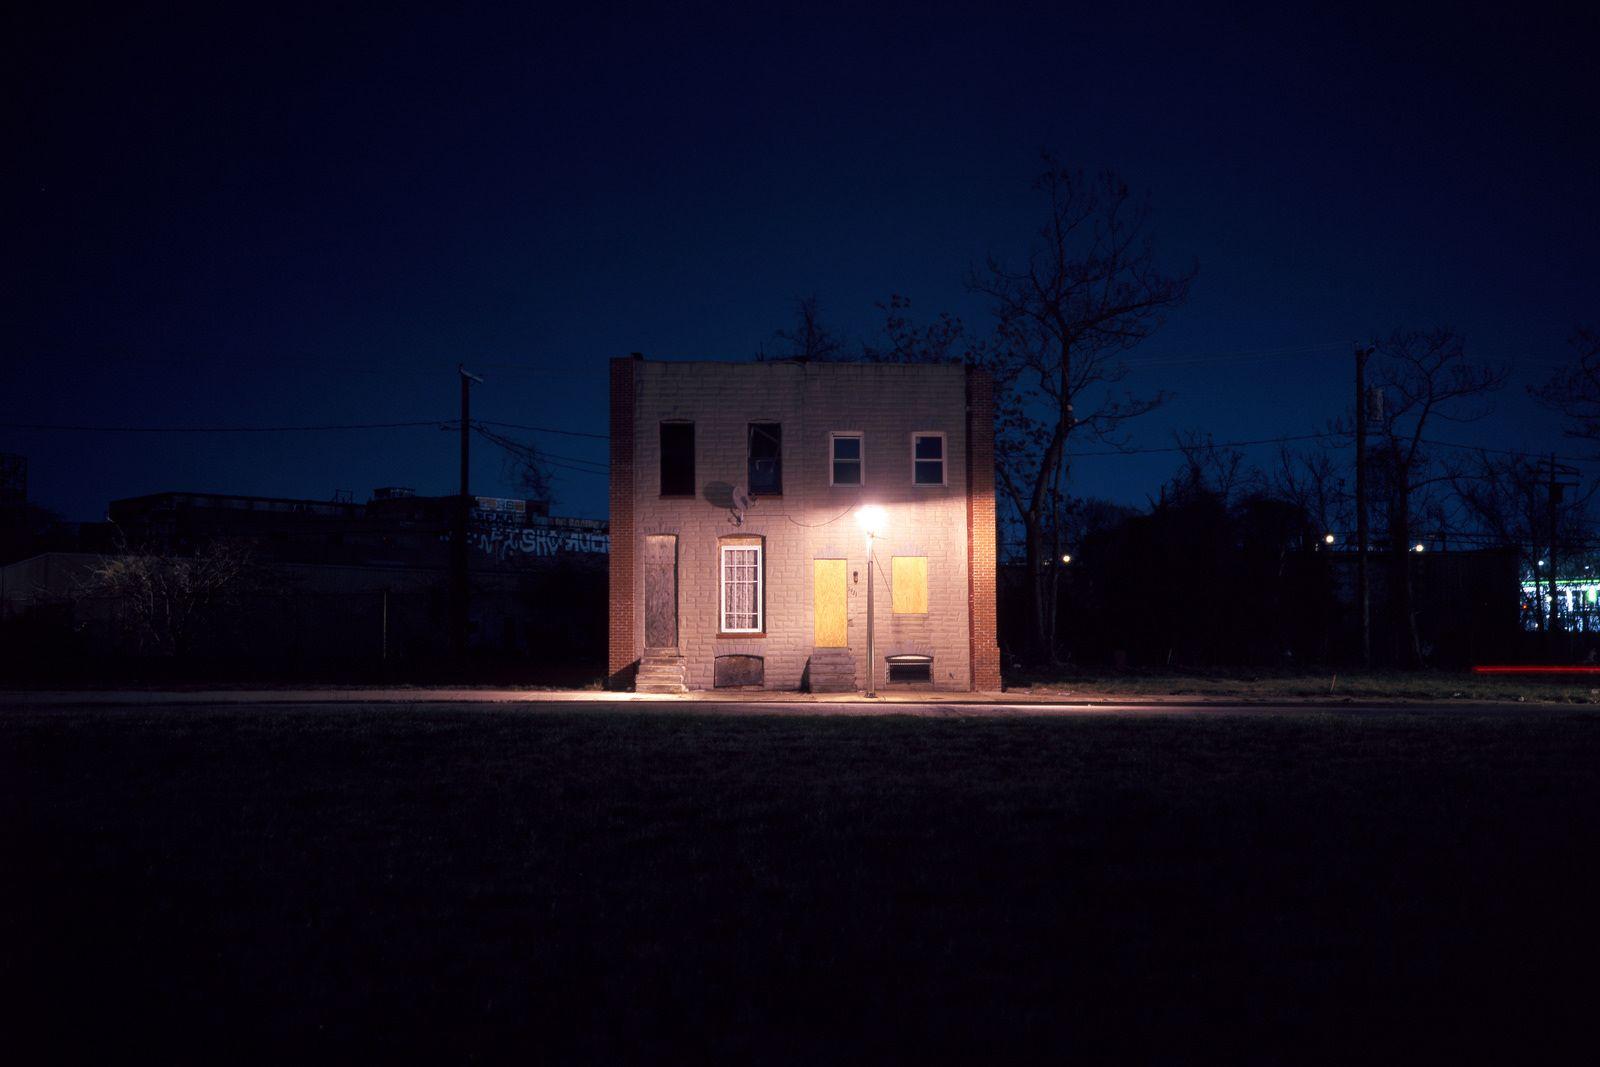 Inner harbor patrick joust nocturnes house styles